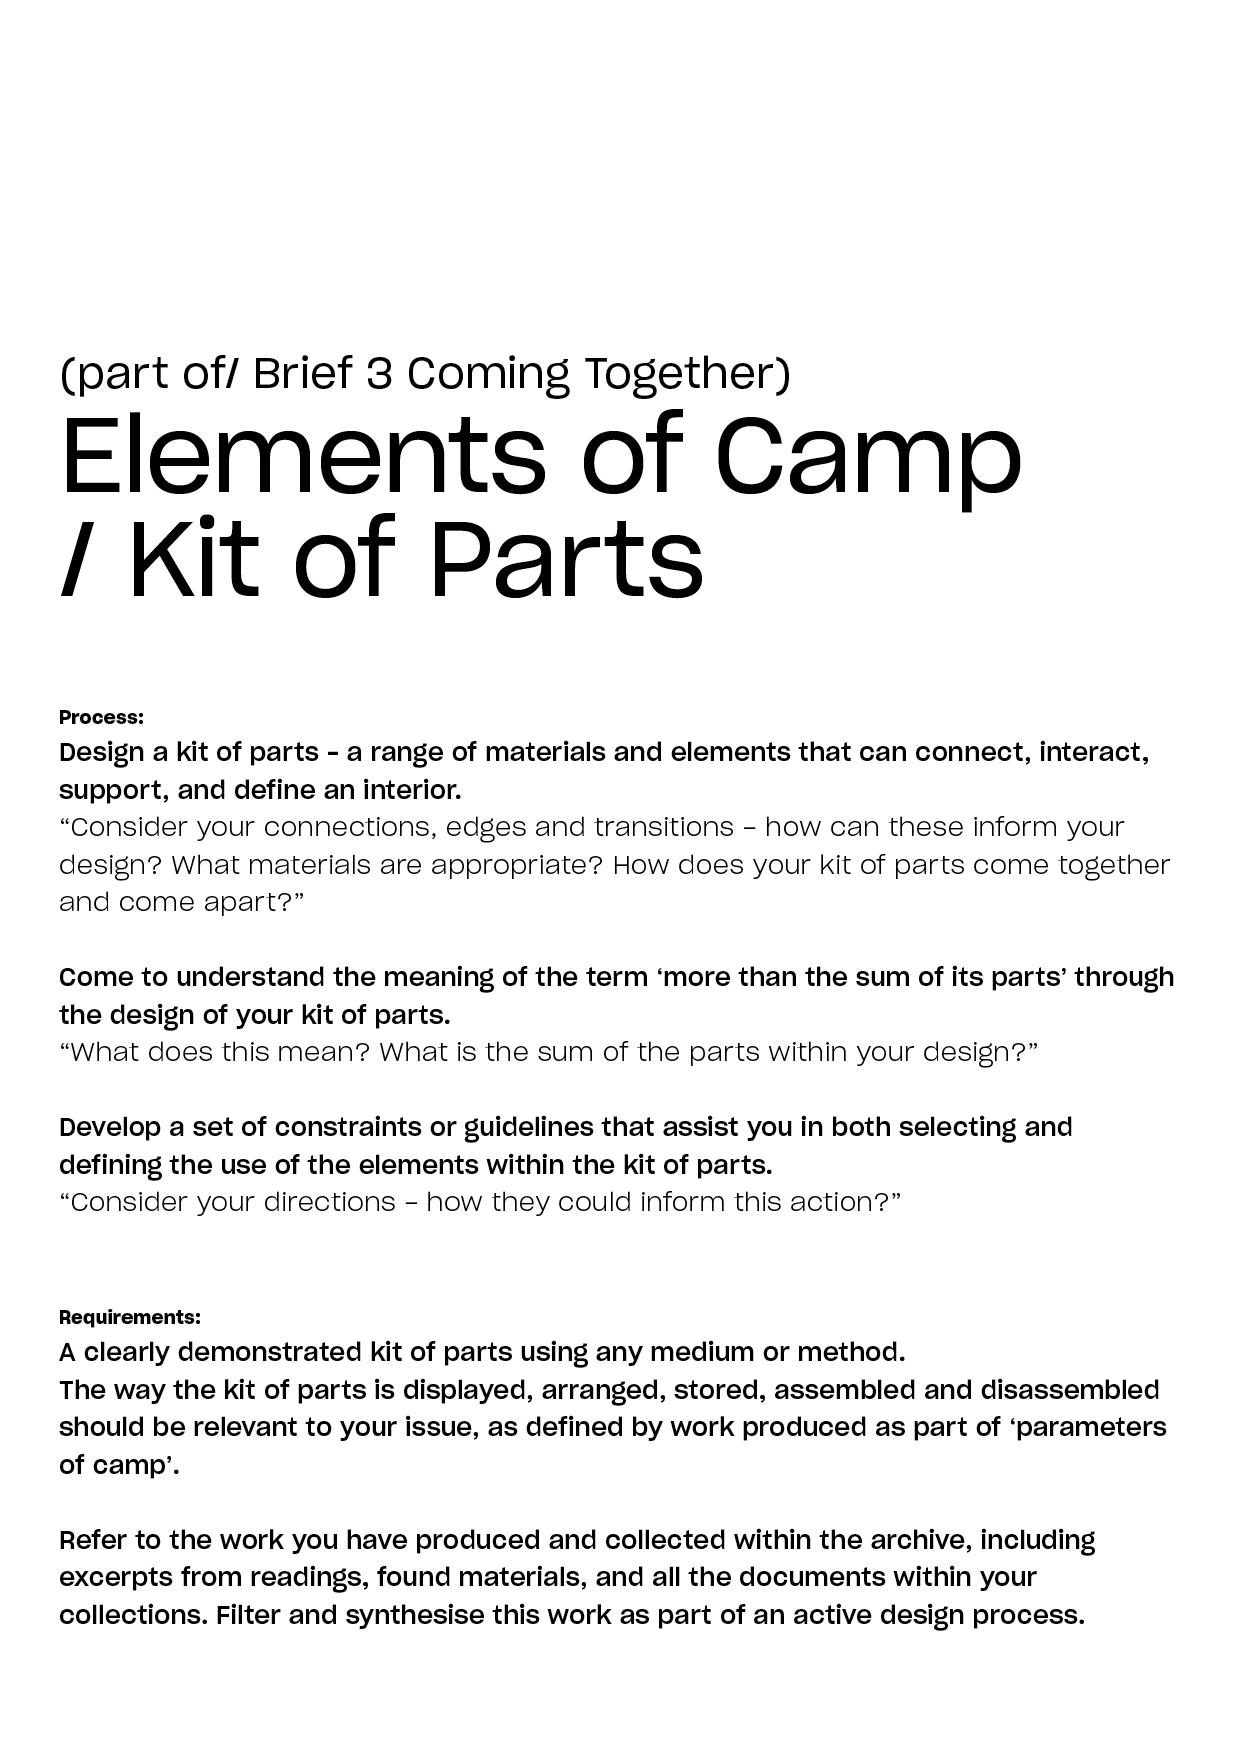 Brief_Counter-Culture-Camp-Ground_0120.jpg